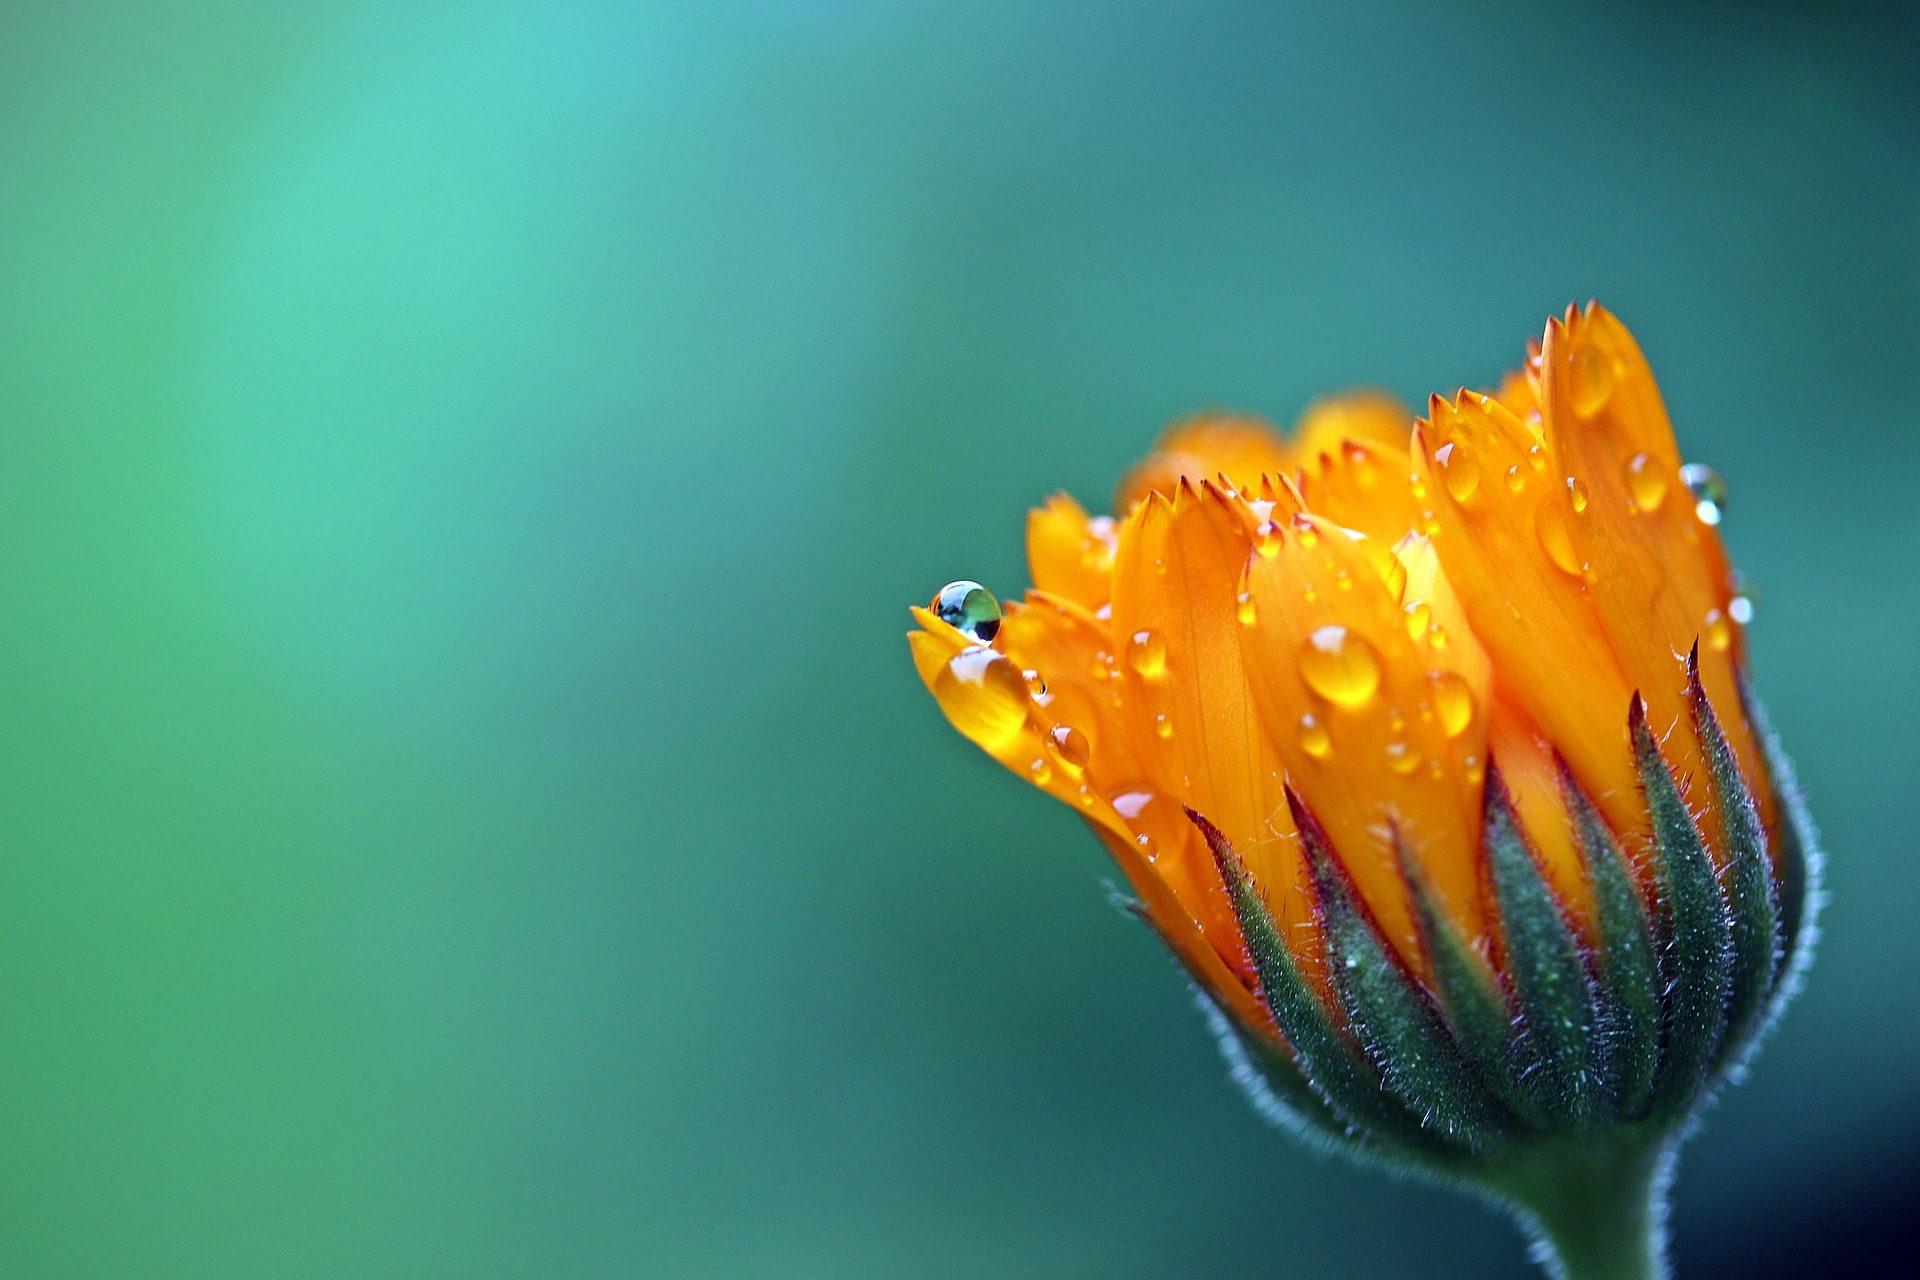 Ringelblume, Blume, Rocio, Orange, Blütenblätter - Wallpaper HD - Prof.-falken.com